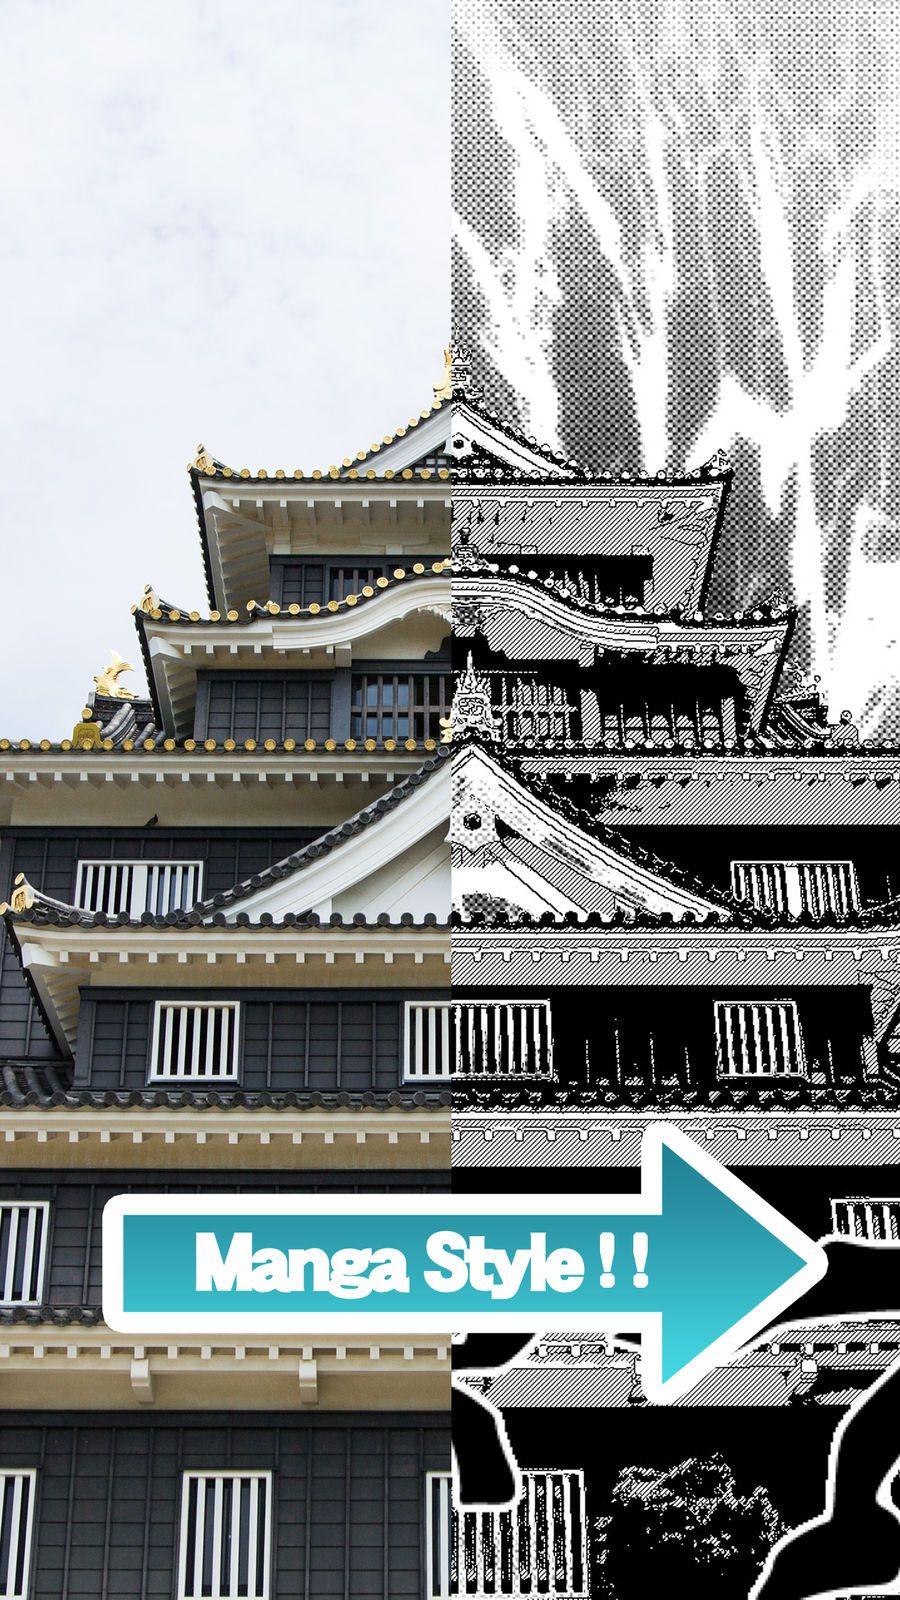 Manga comic camera create comicstyle photos with